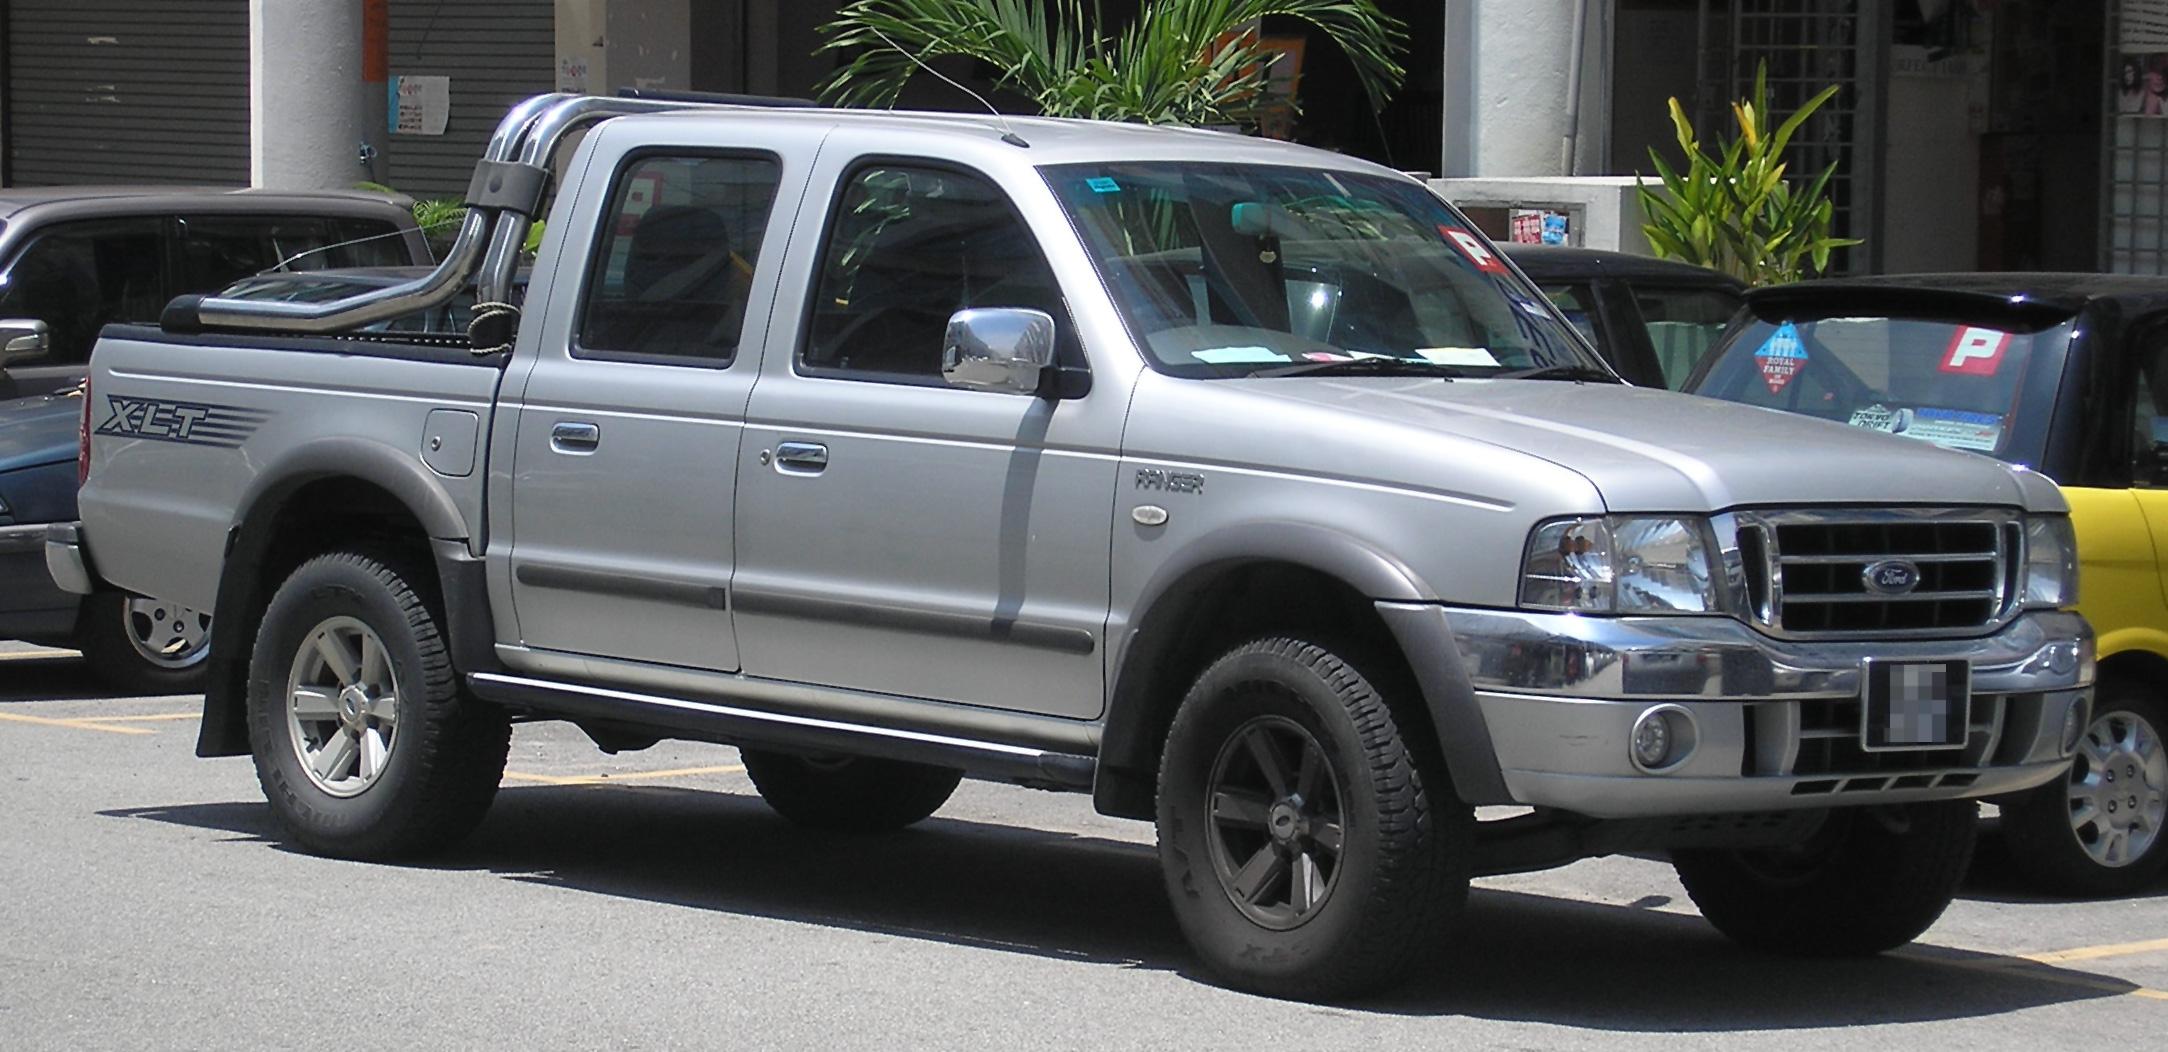 Ford Ranger 2019 >> File:Ford Ranger (Southeast Asian, second generation) (front), Serdang.jpg - Wikimedia Commons